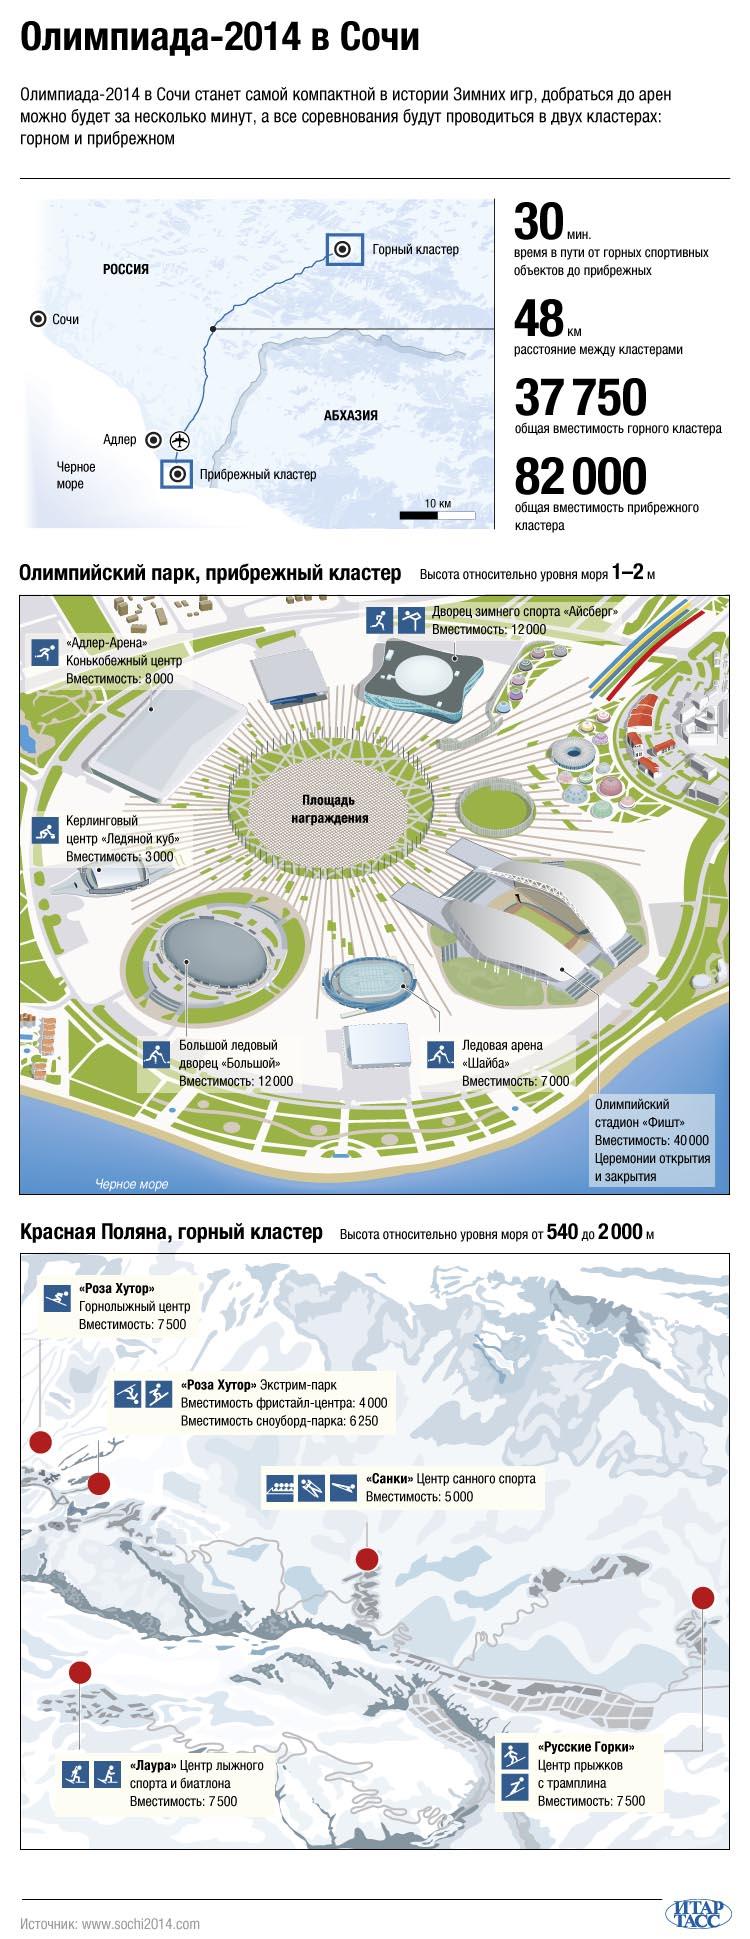 Олимпиада-2014 в Сочи